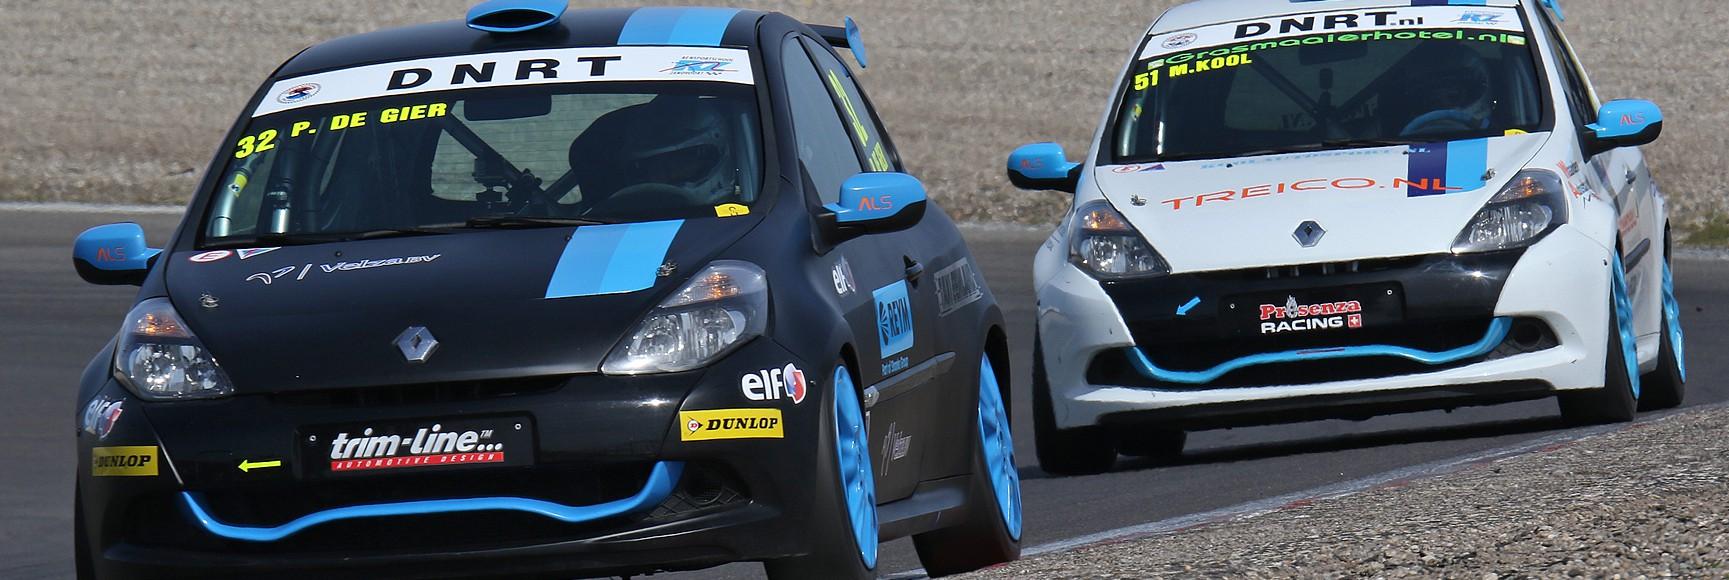 Verslag race 1 DNRT Zandvoort